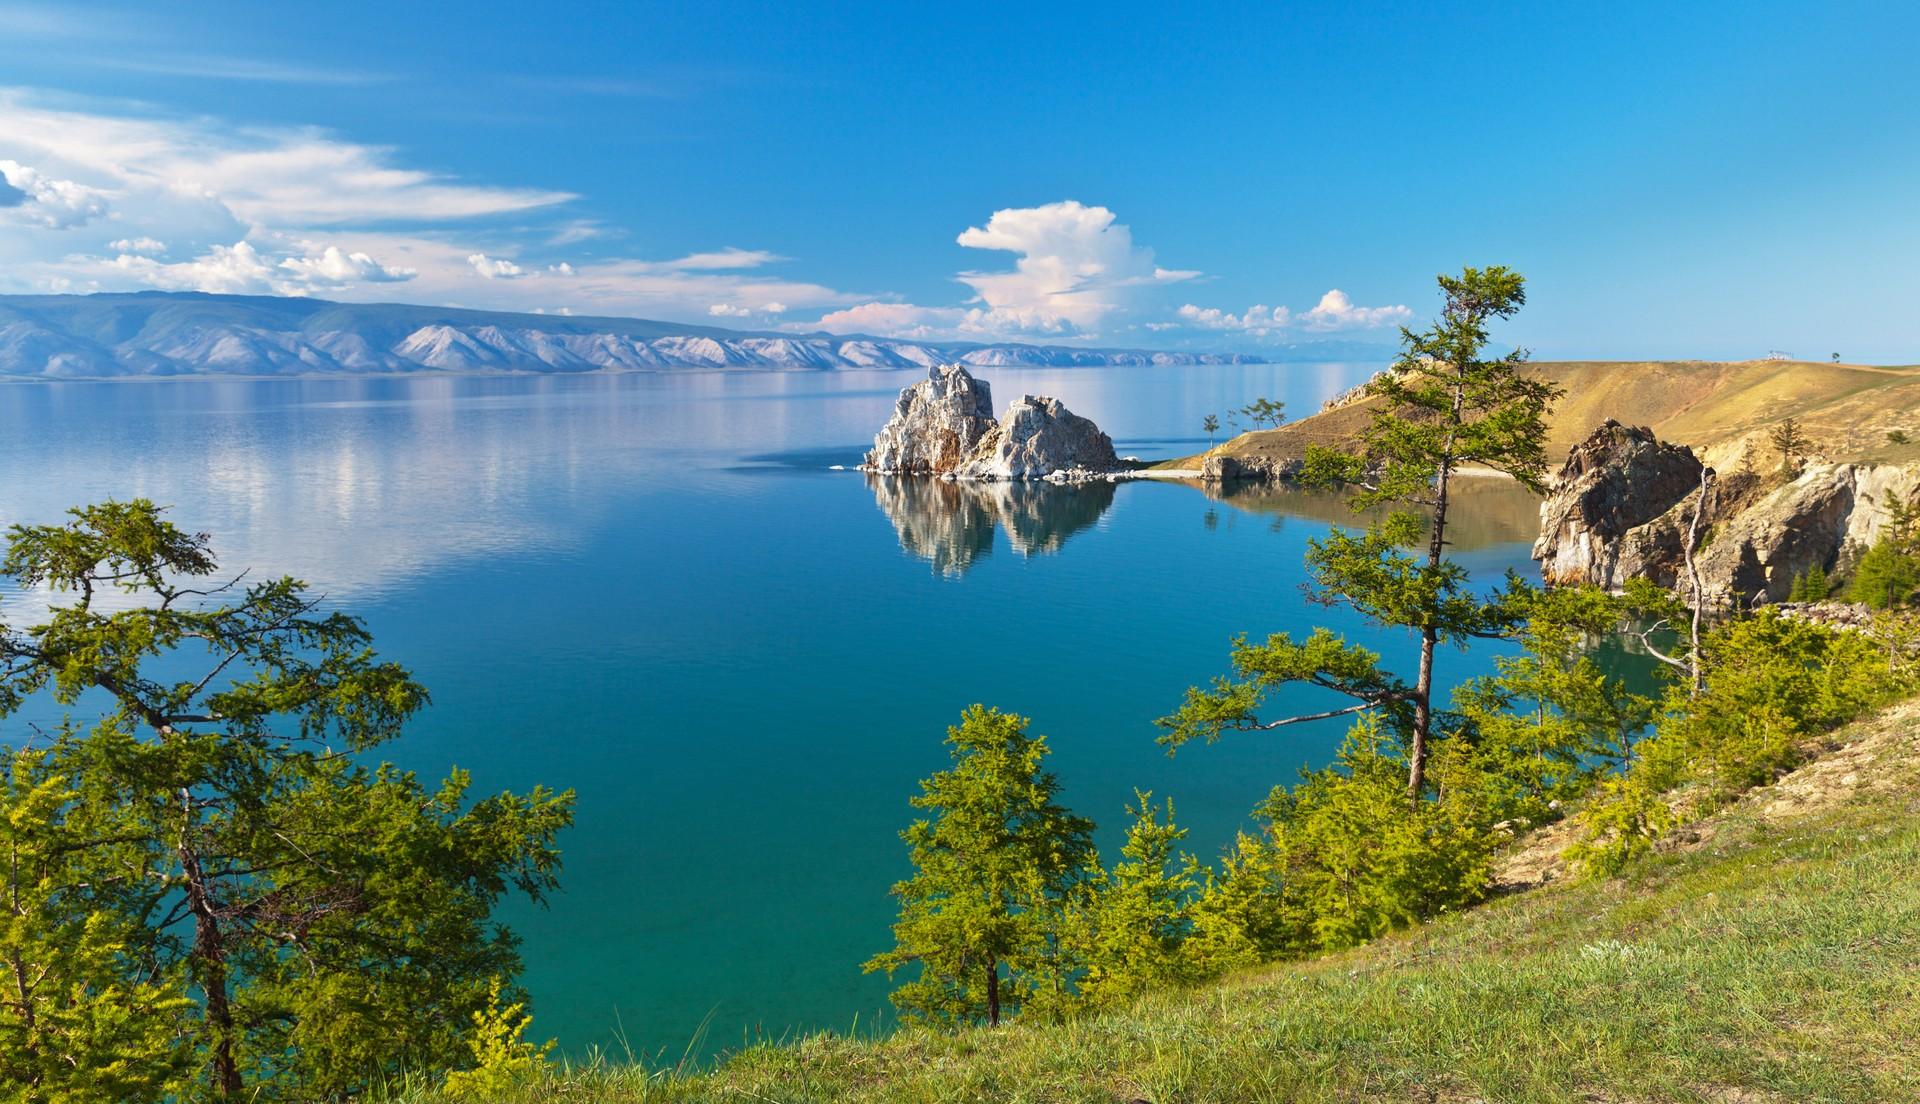 Top 10 scenic journeys: Lake Baikal